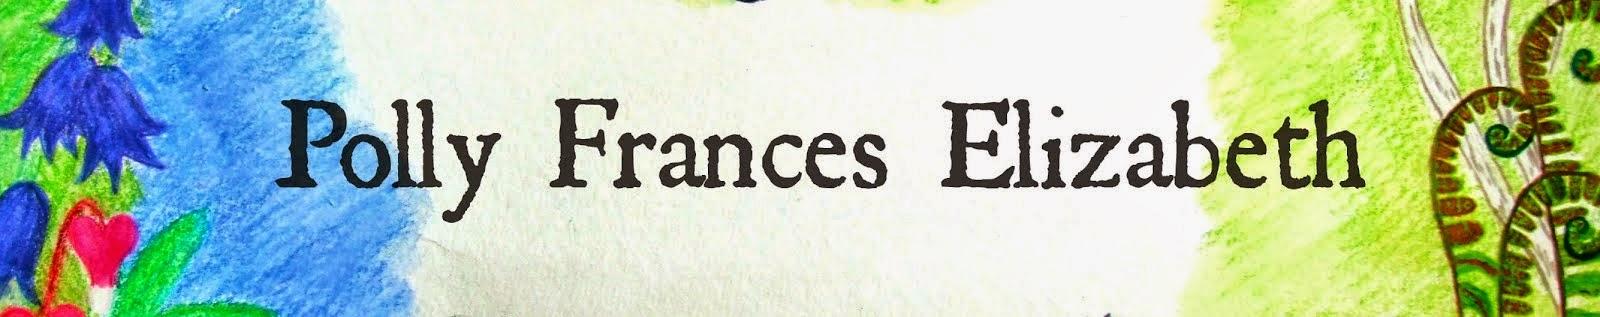 Polly Frances Elizabeth